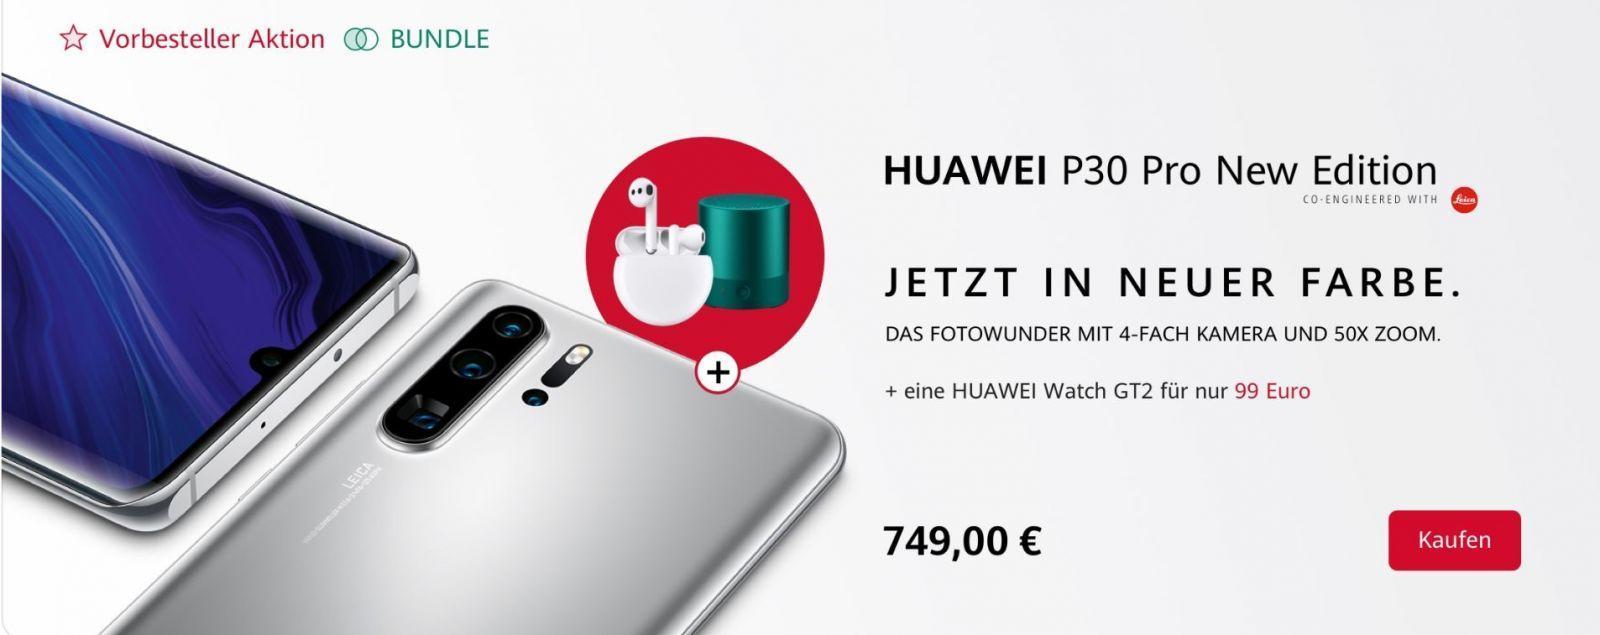 huawei-p30-pro-new-edition-img-2_large